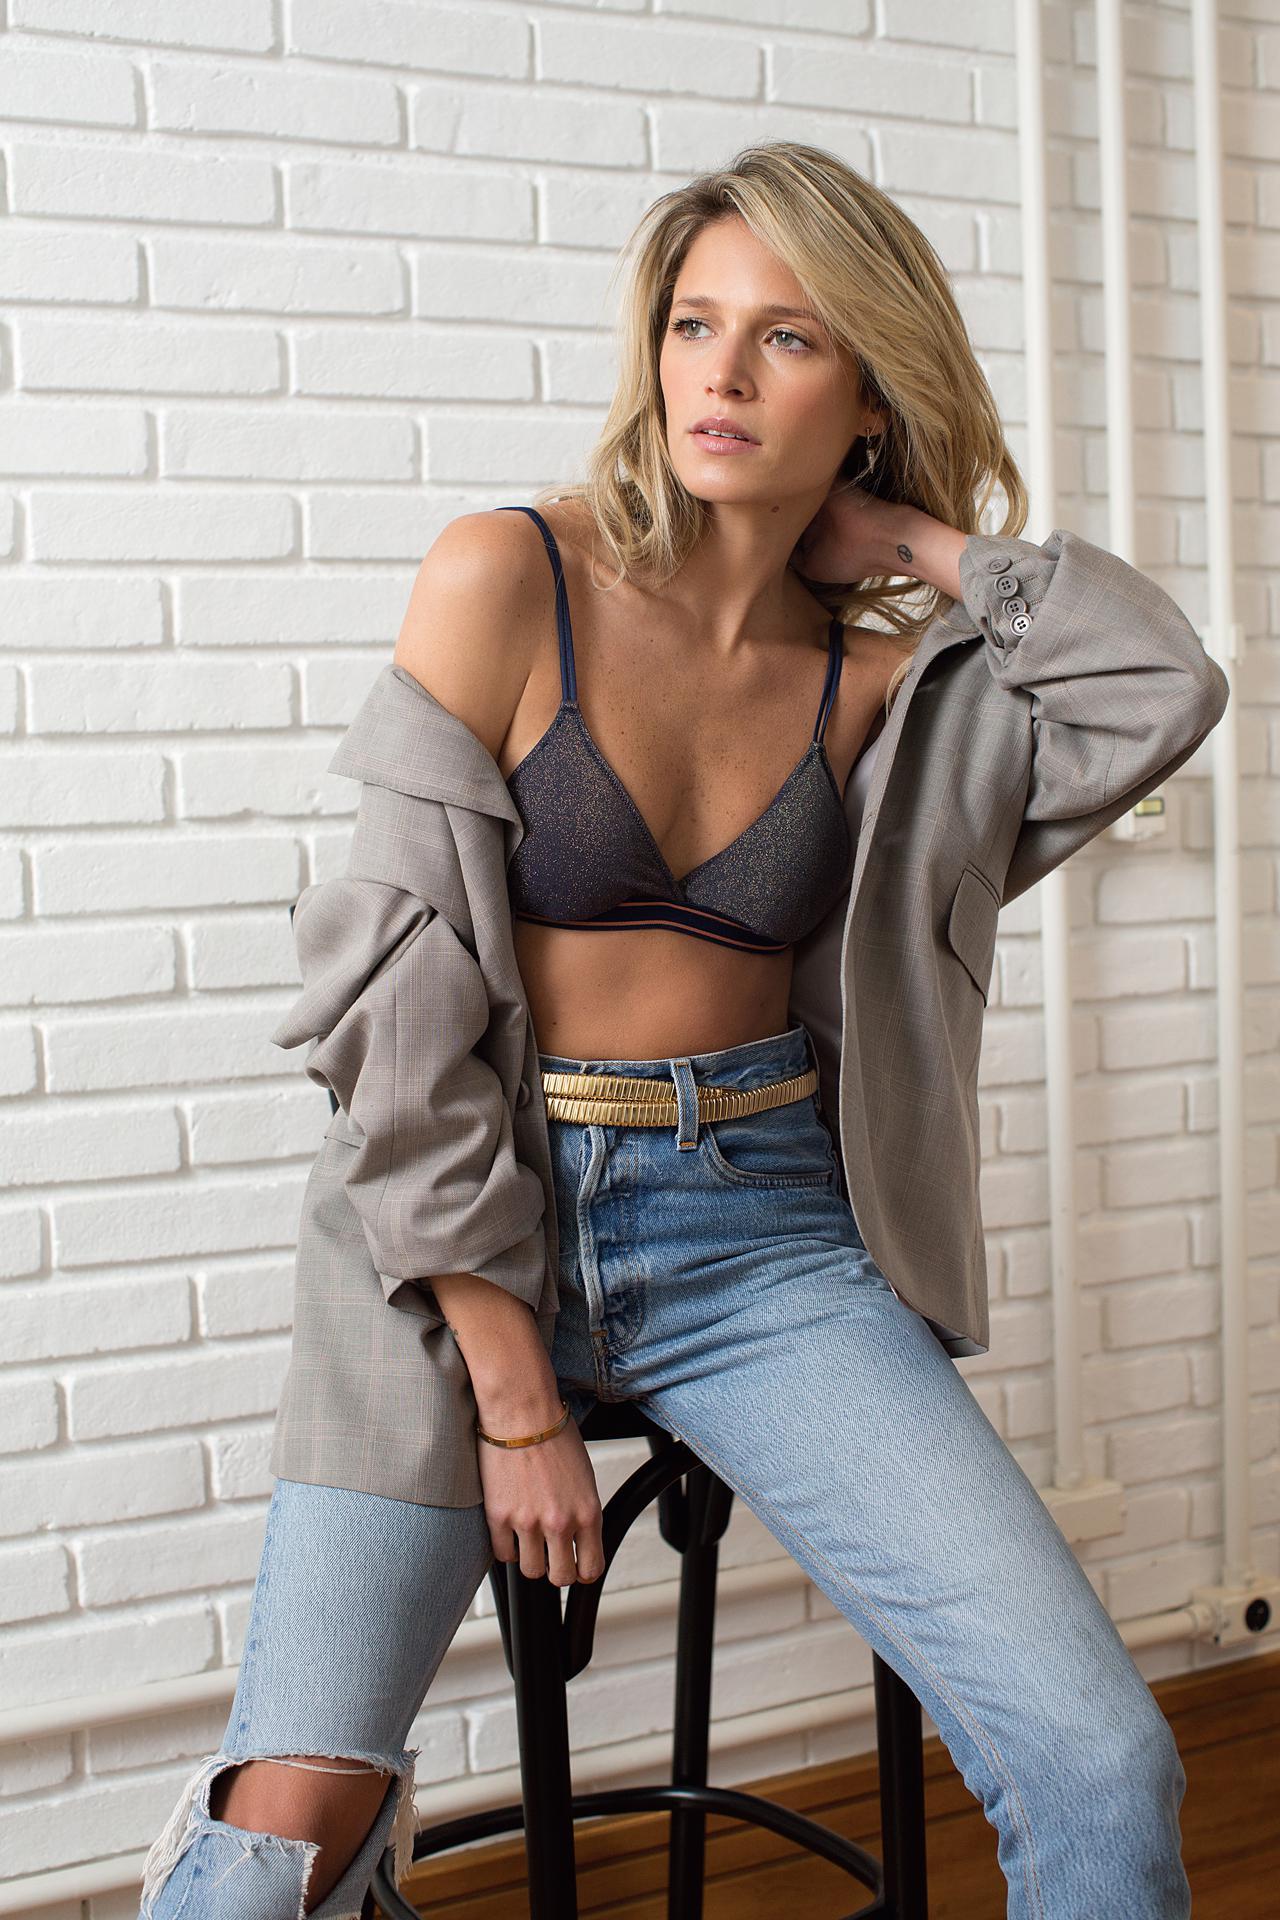 www.juicysantos.com.br - valisere sutiã de lurex preto com jeans